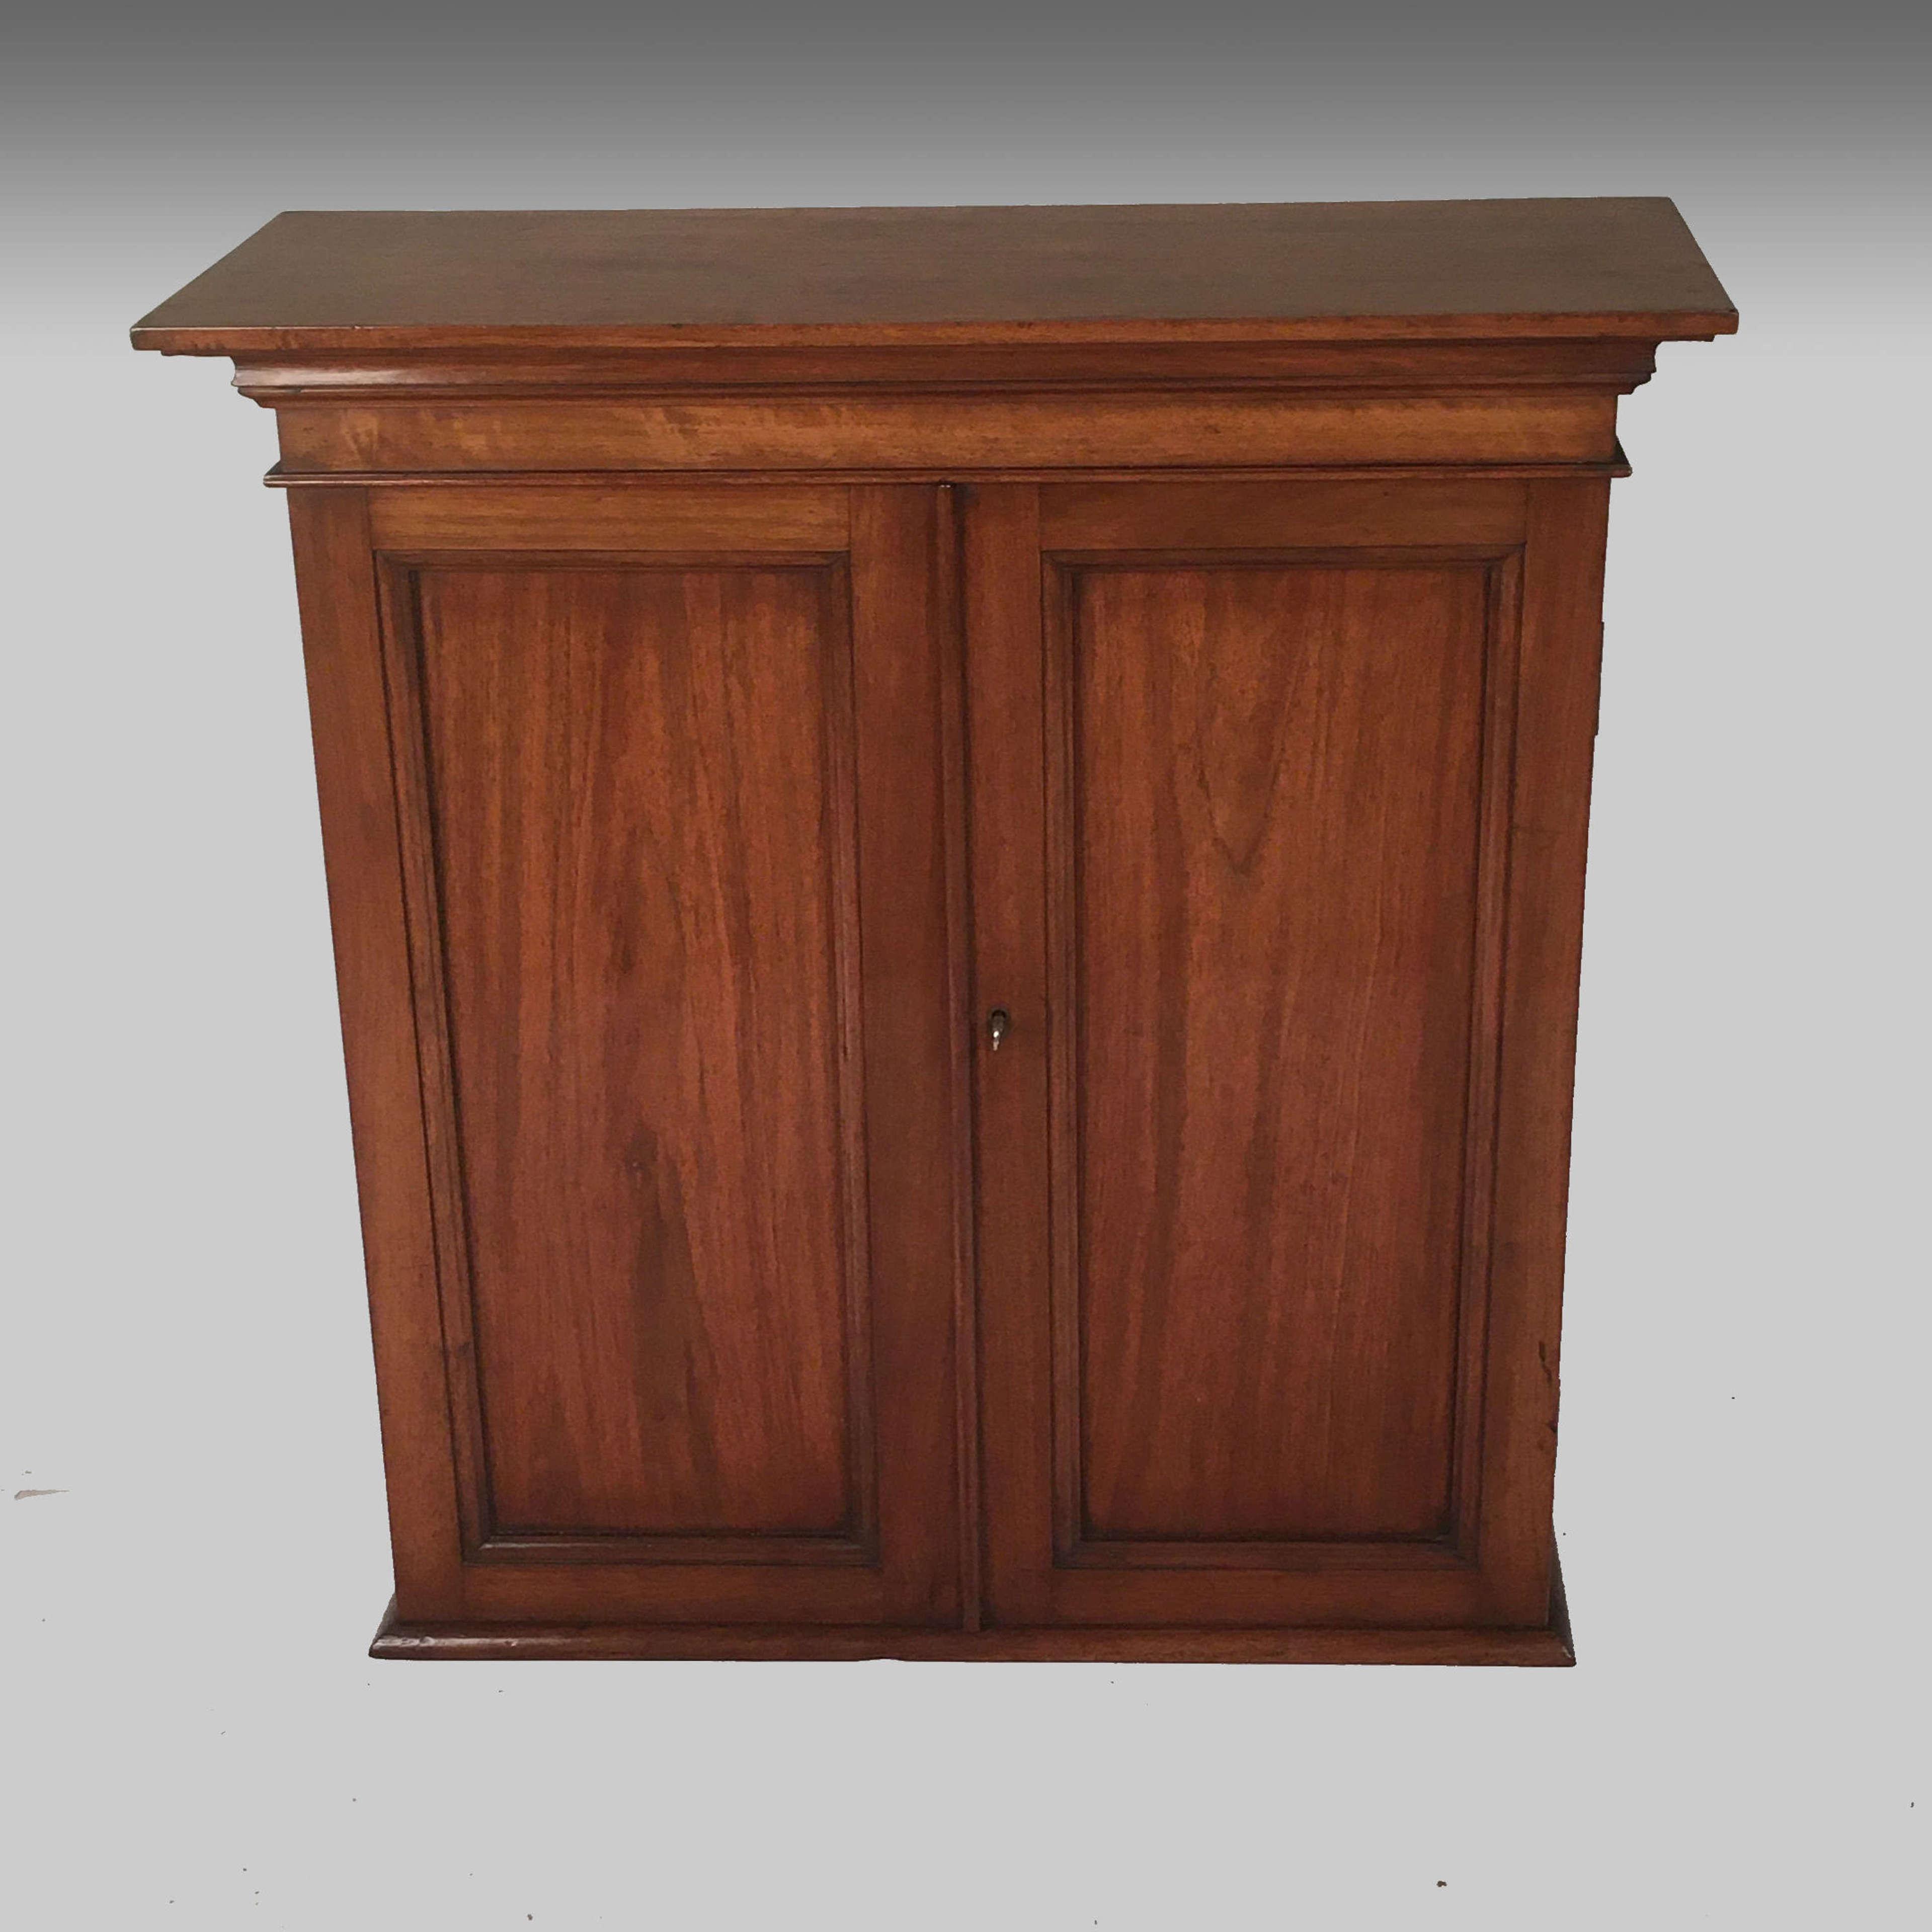 19th century walnut wall cabinet